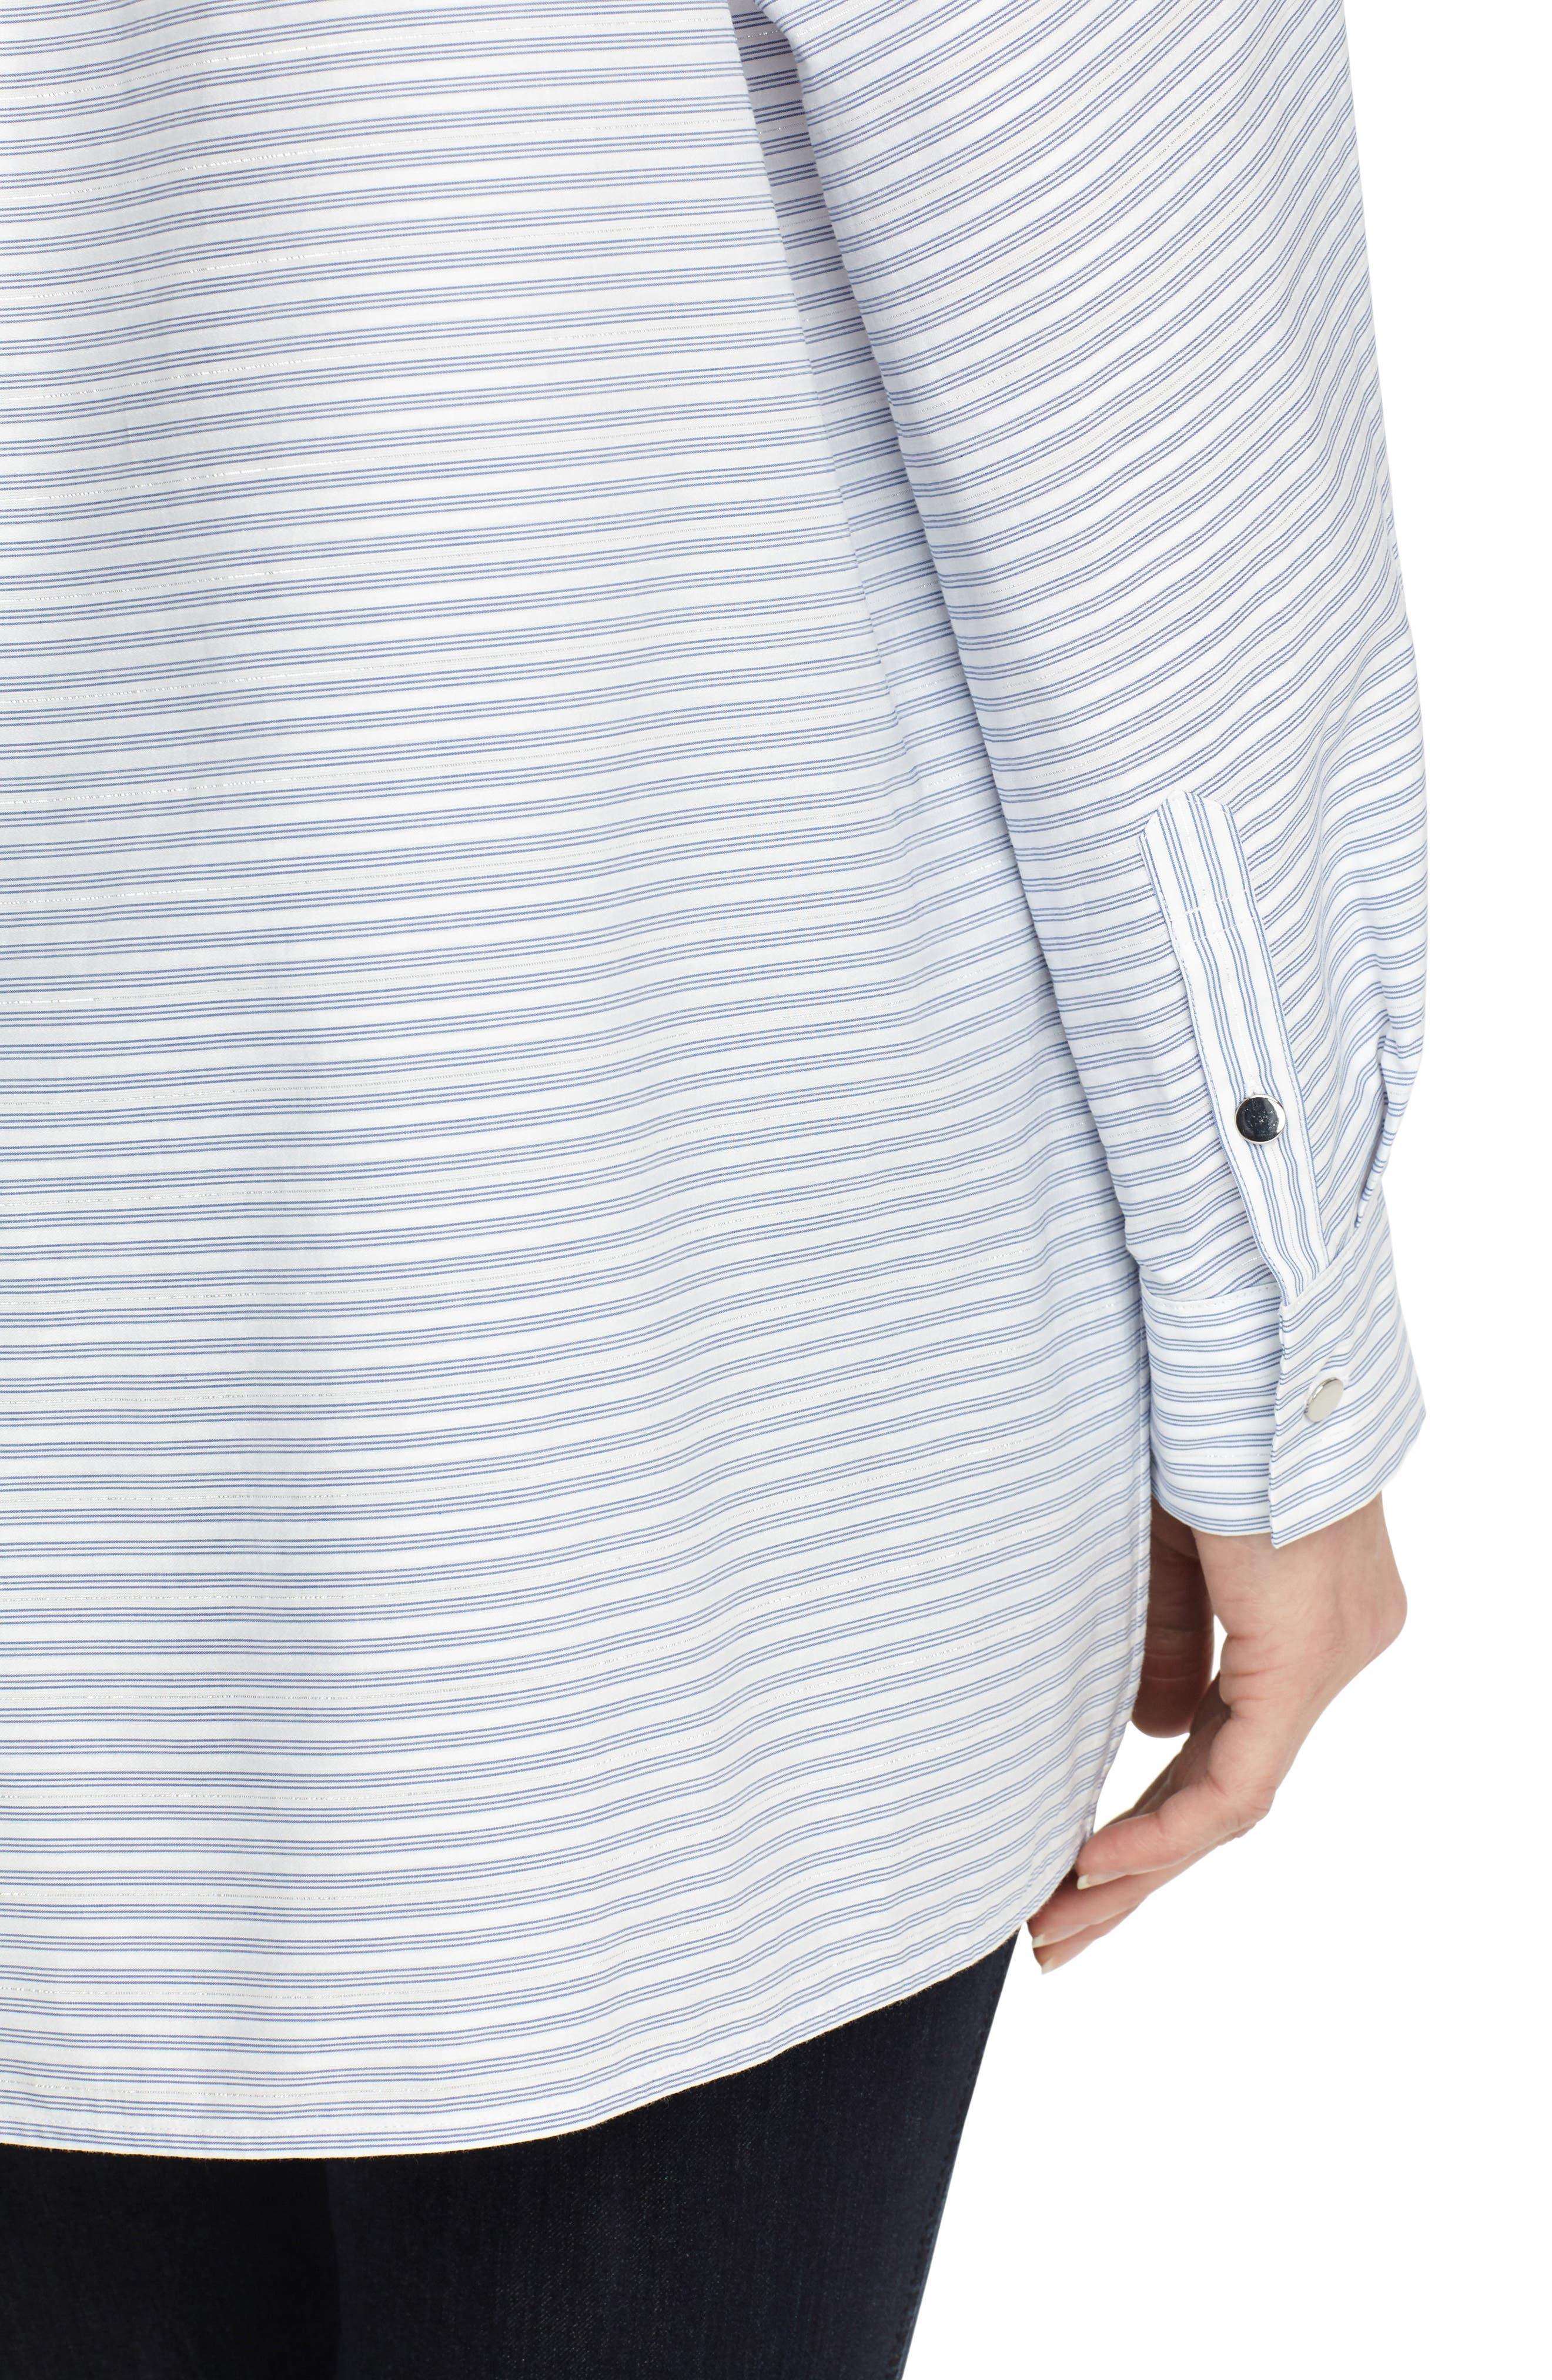 Alyssa Metallic Stripe Blouse,                             Alternate thumbnail 3, color,                             Periwinkle Multi